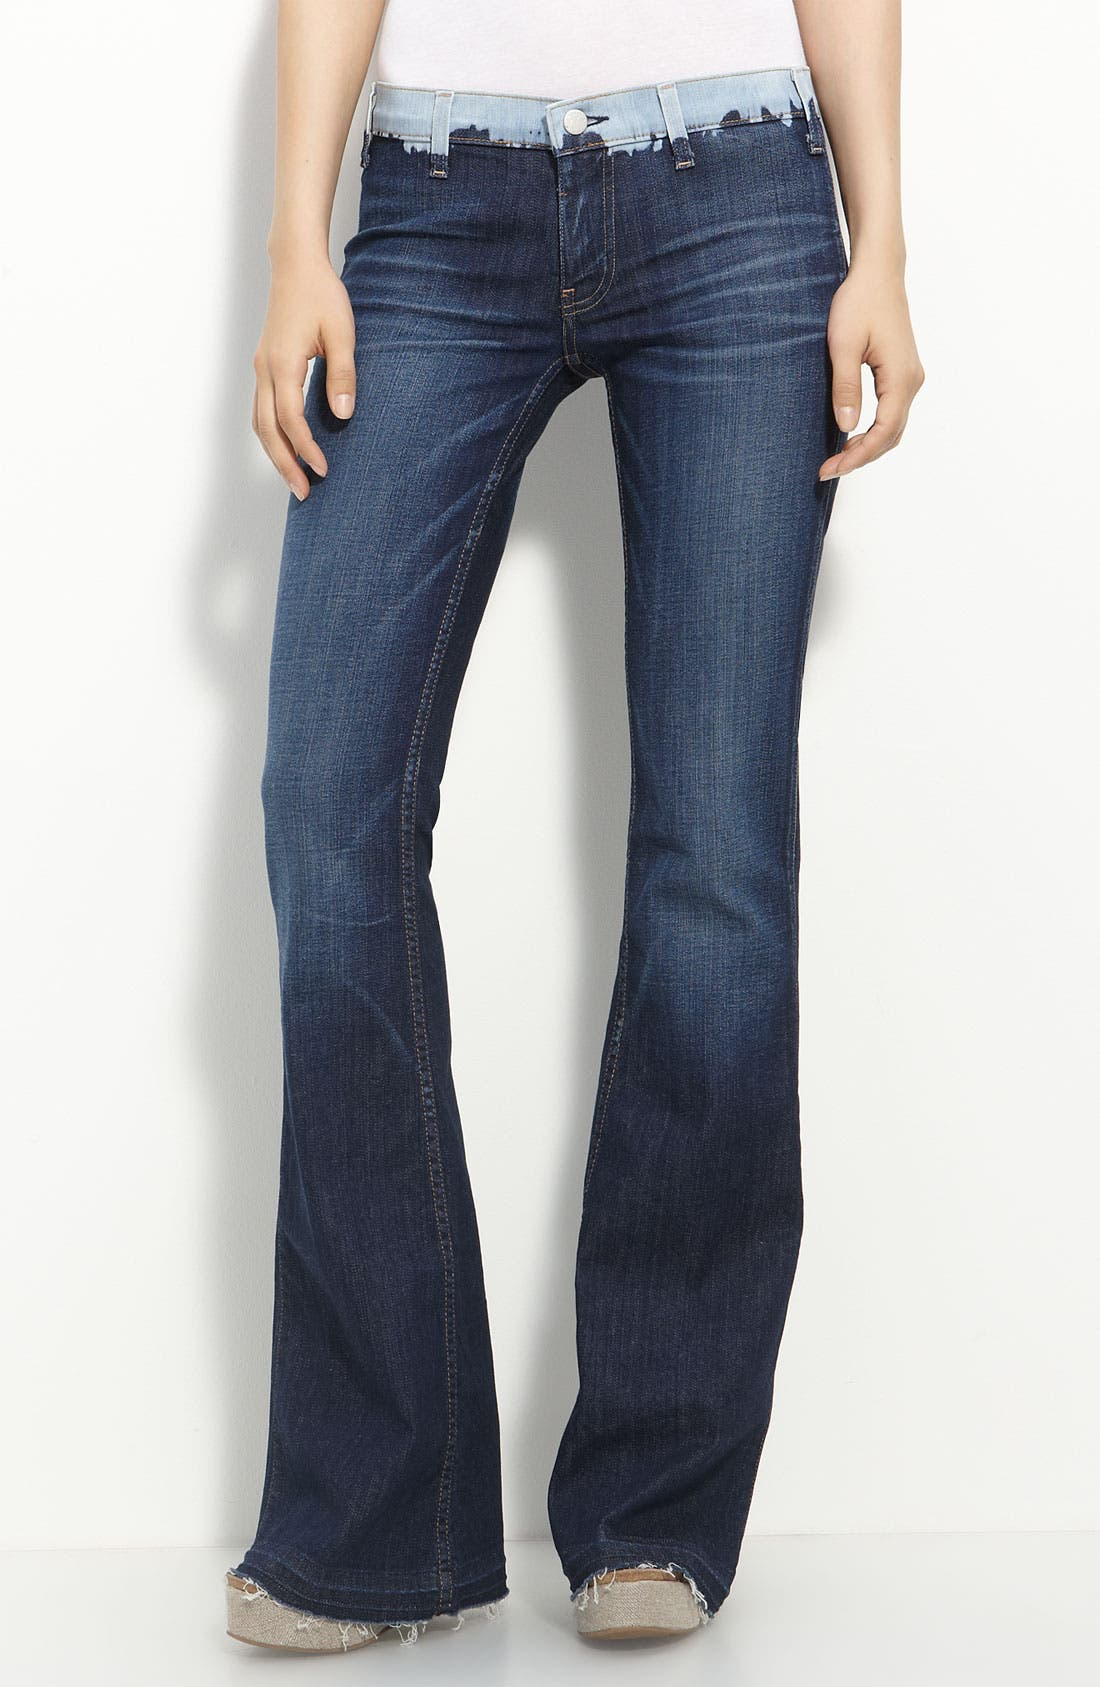 Alternate Image 1 Selected - TEXTILE Elizabeth and James Flare Leg Stretch Jeans